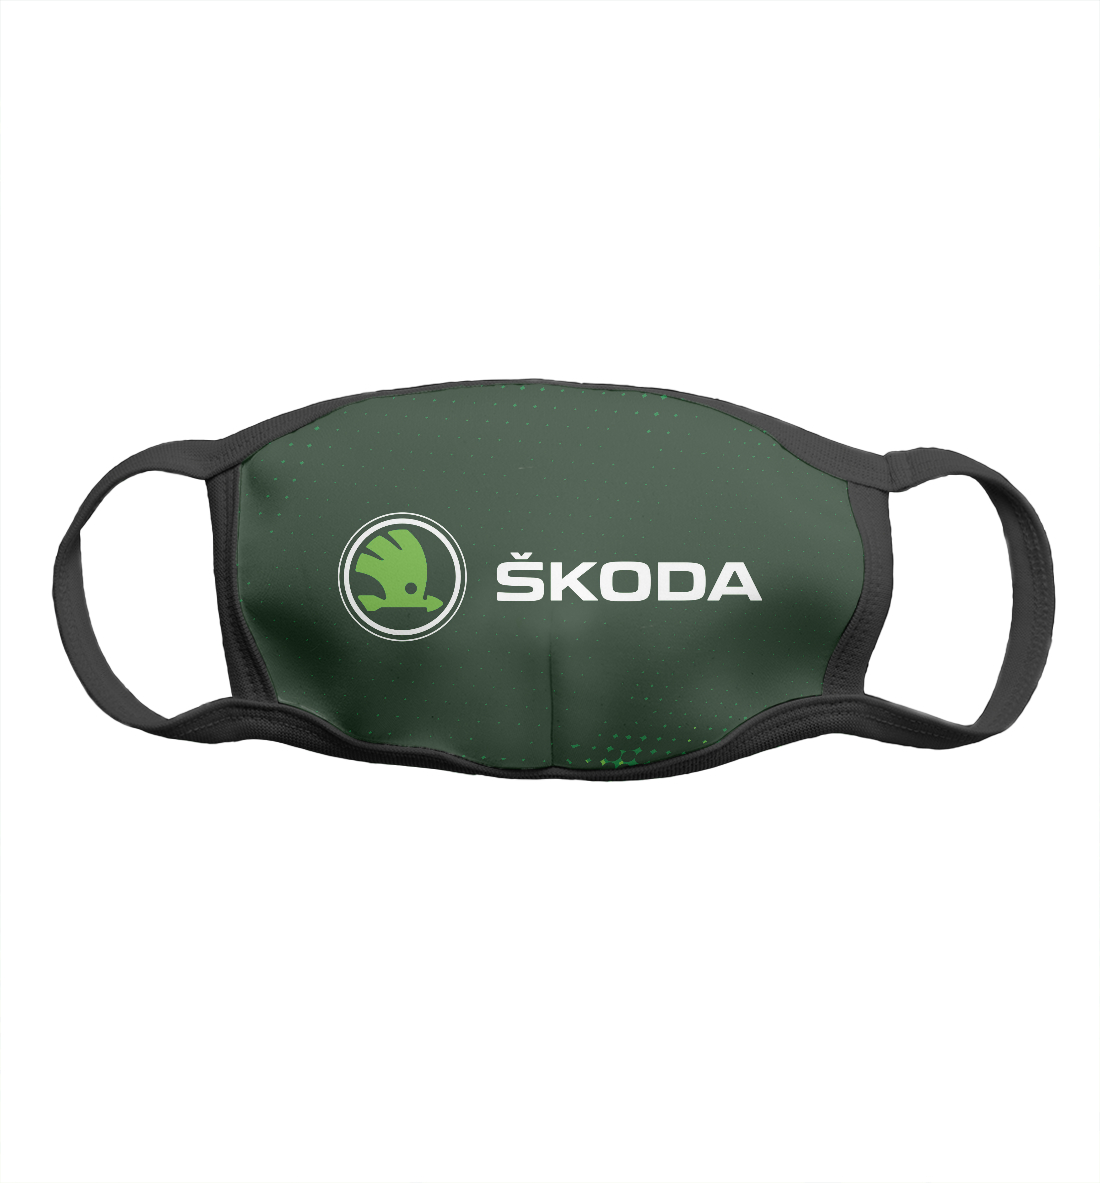 Skoda / Шкода наклейка защитная на внутренний порог багажника черный карбон chn skoda karoq 2020 шкода карок